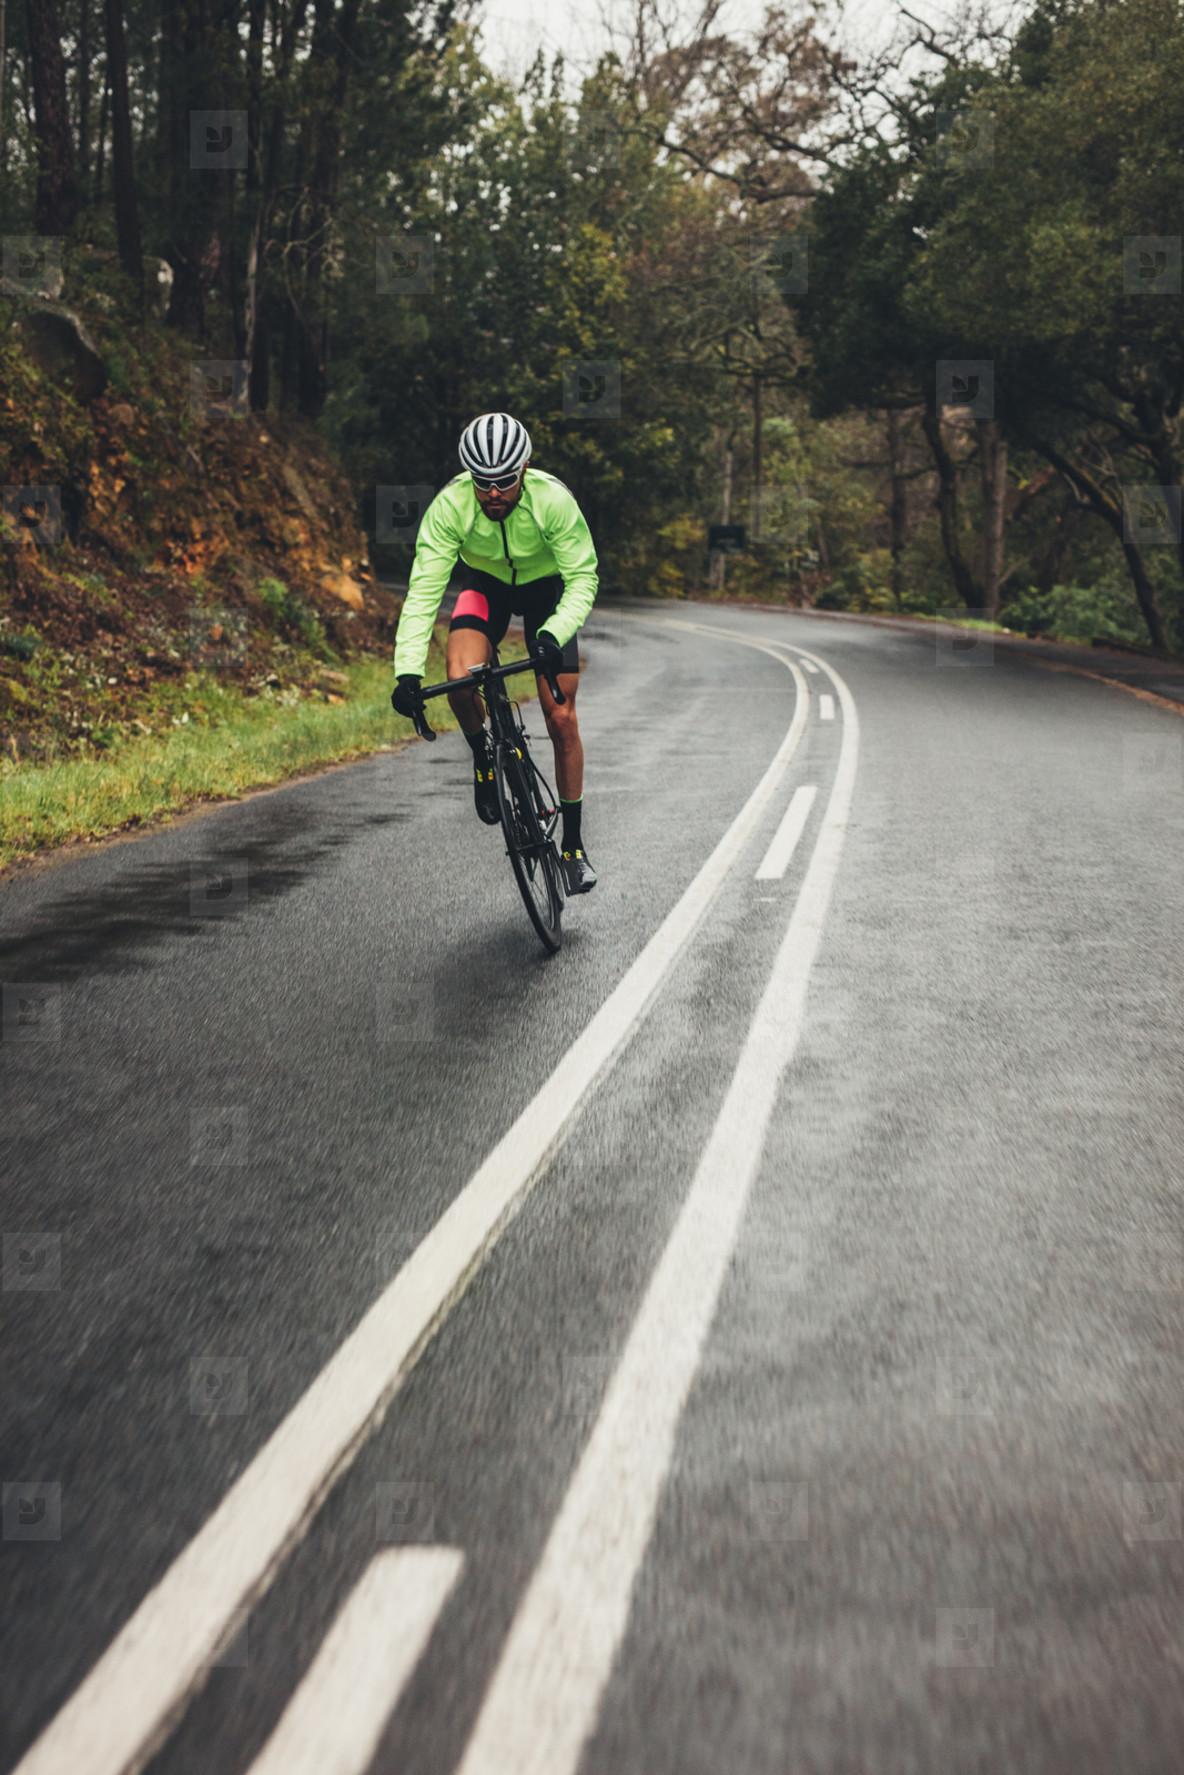 Bicycle rider with bike on wet asphalt road